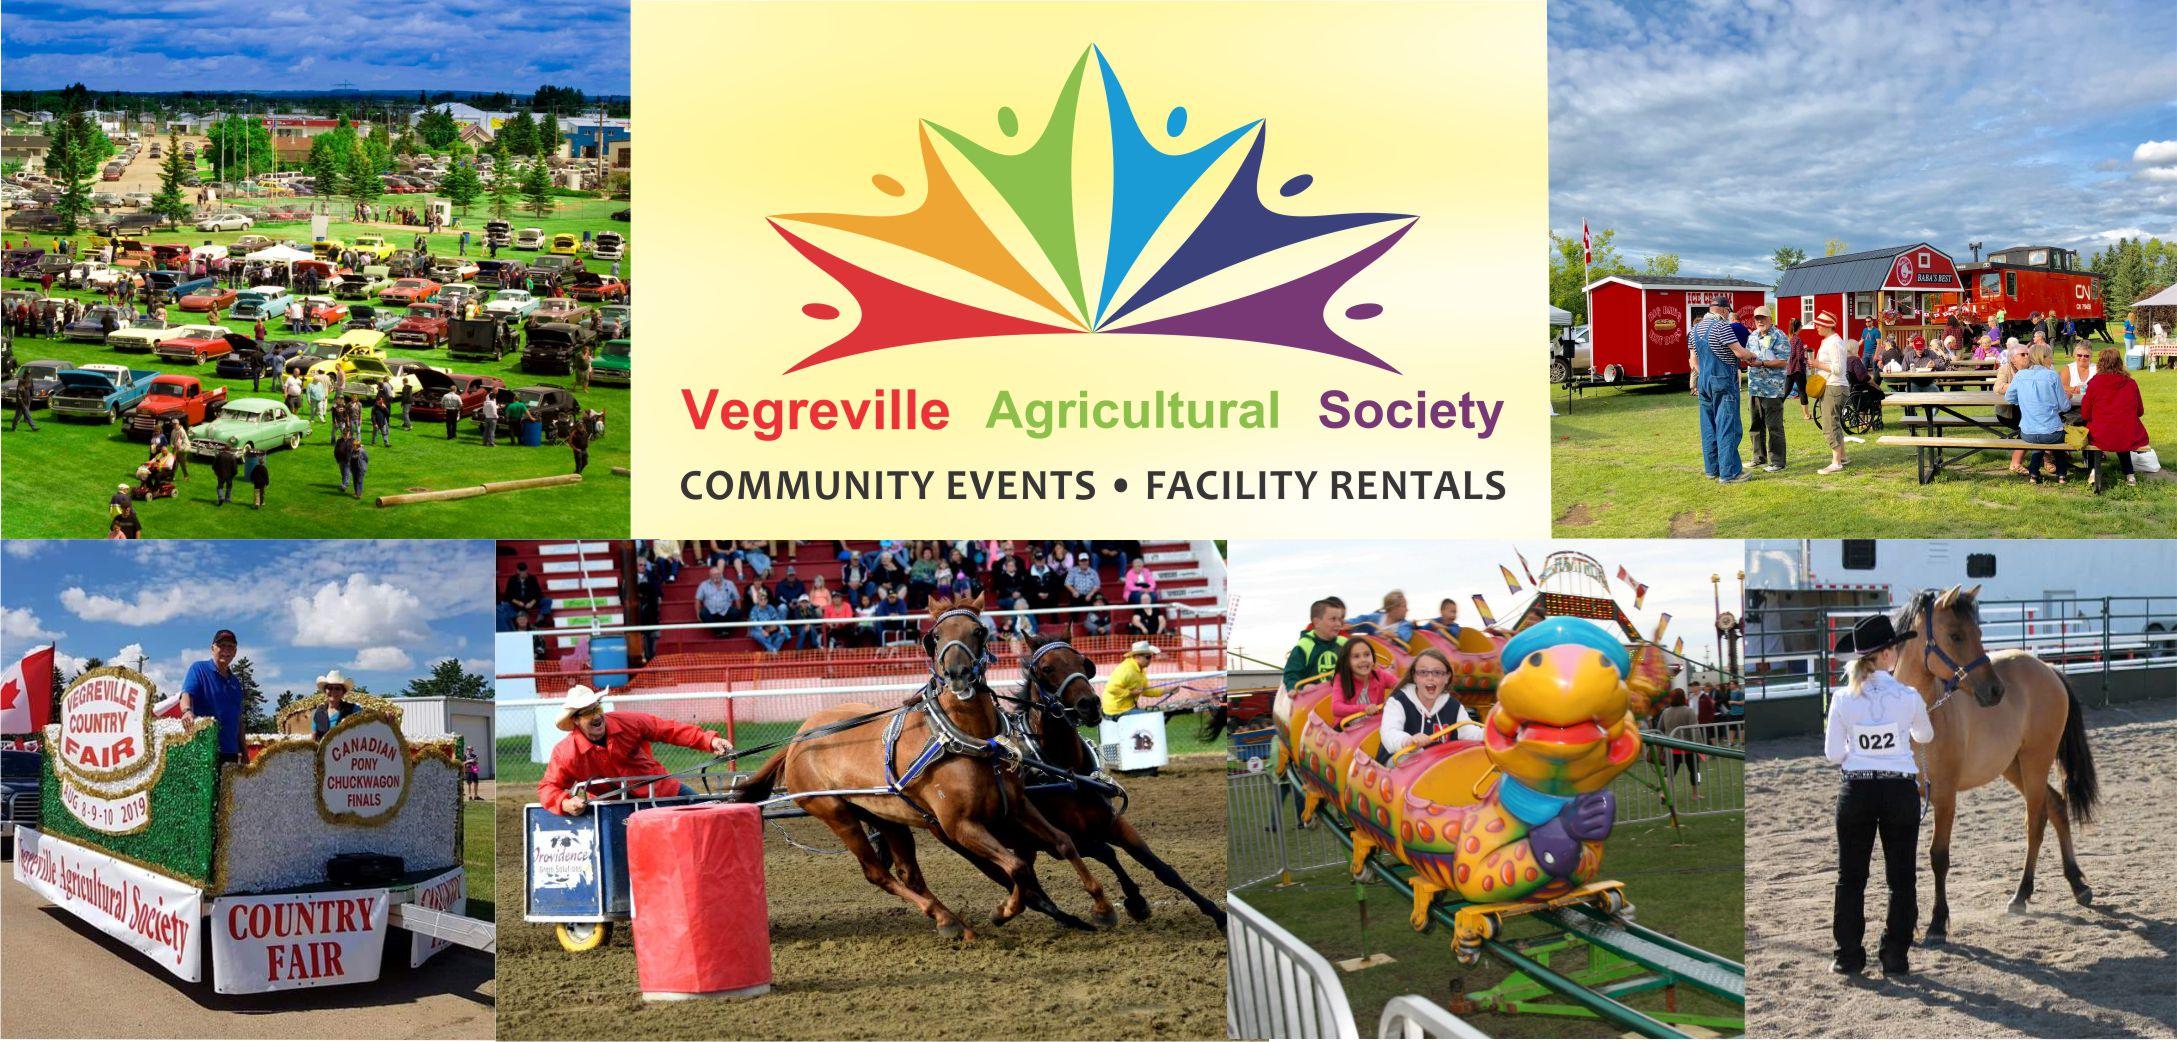 Vegreville Agricultural Society